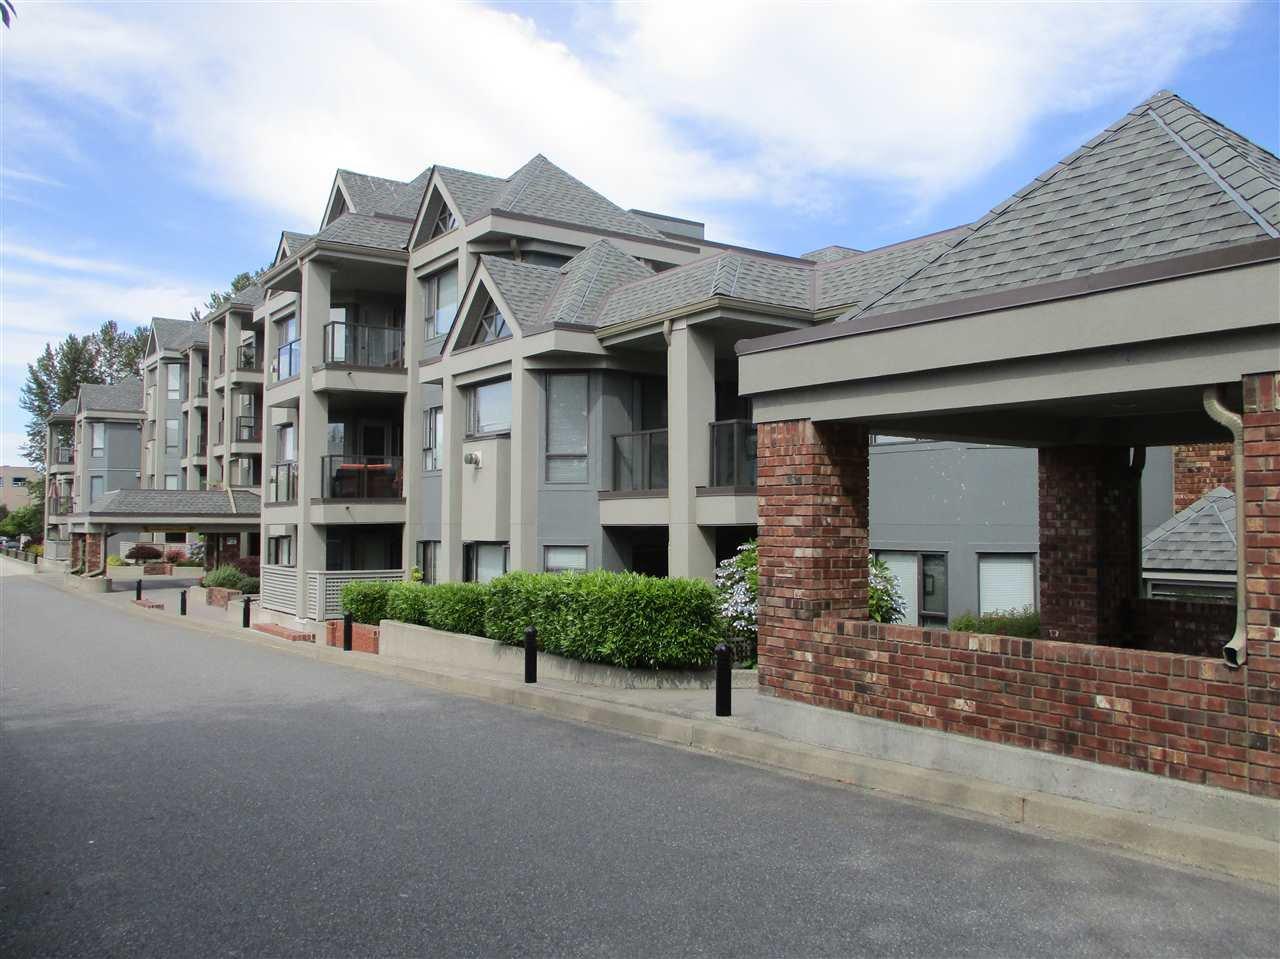 Main Photo: 106 15241 18 AVENUE in Surrey: King George Corridor Condo for sale (South Surrey White Rock)  : MLS®# R2190046